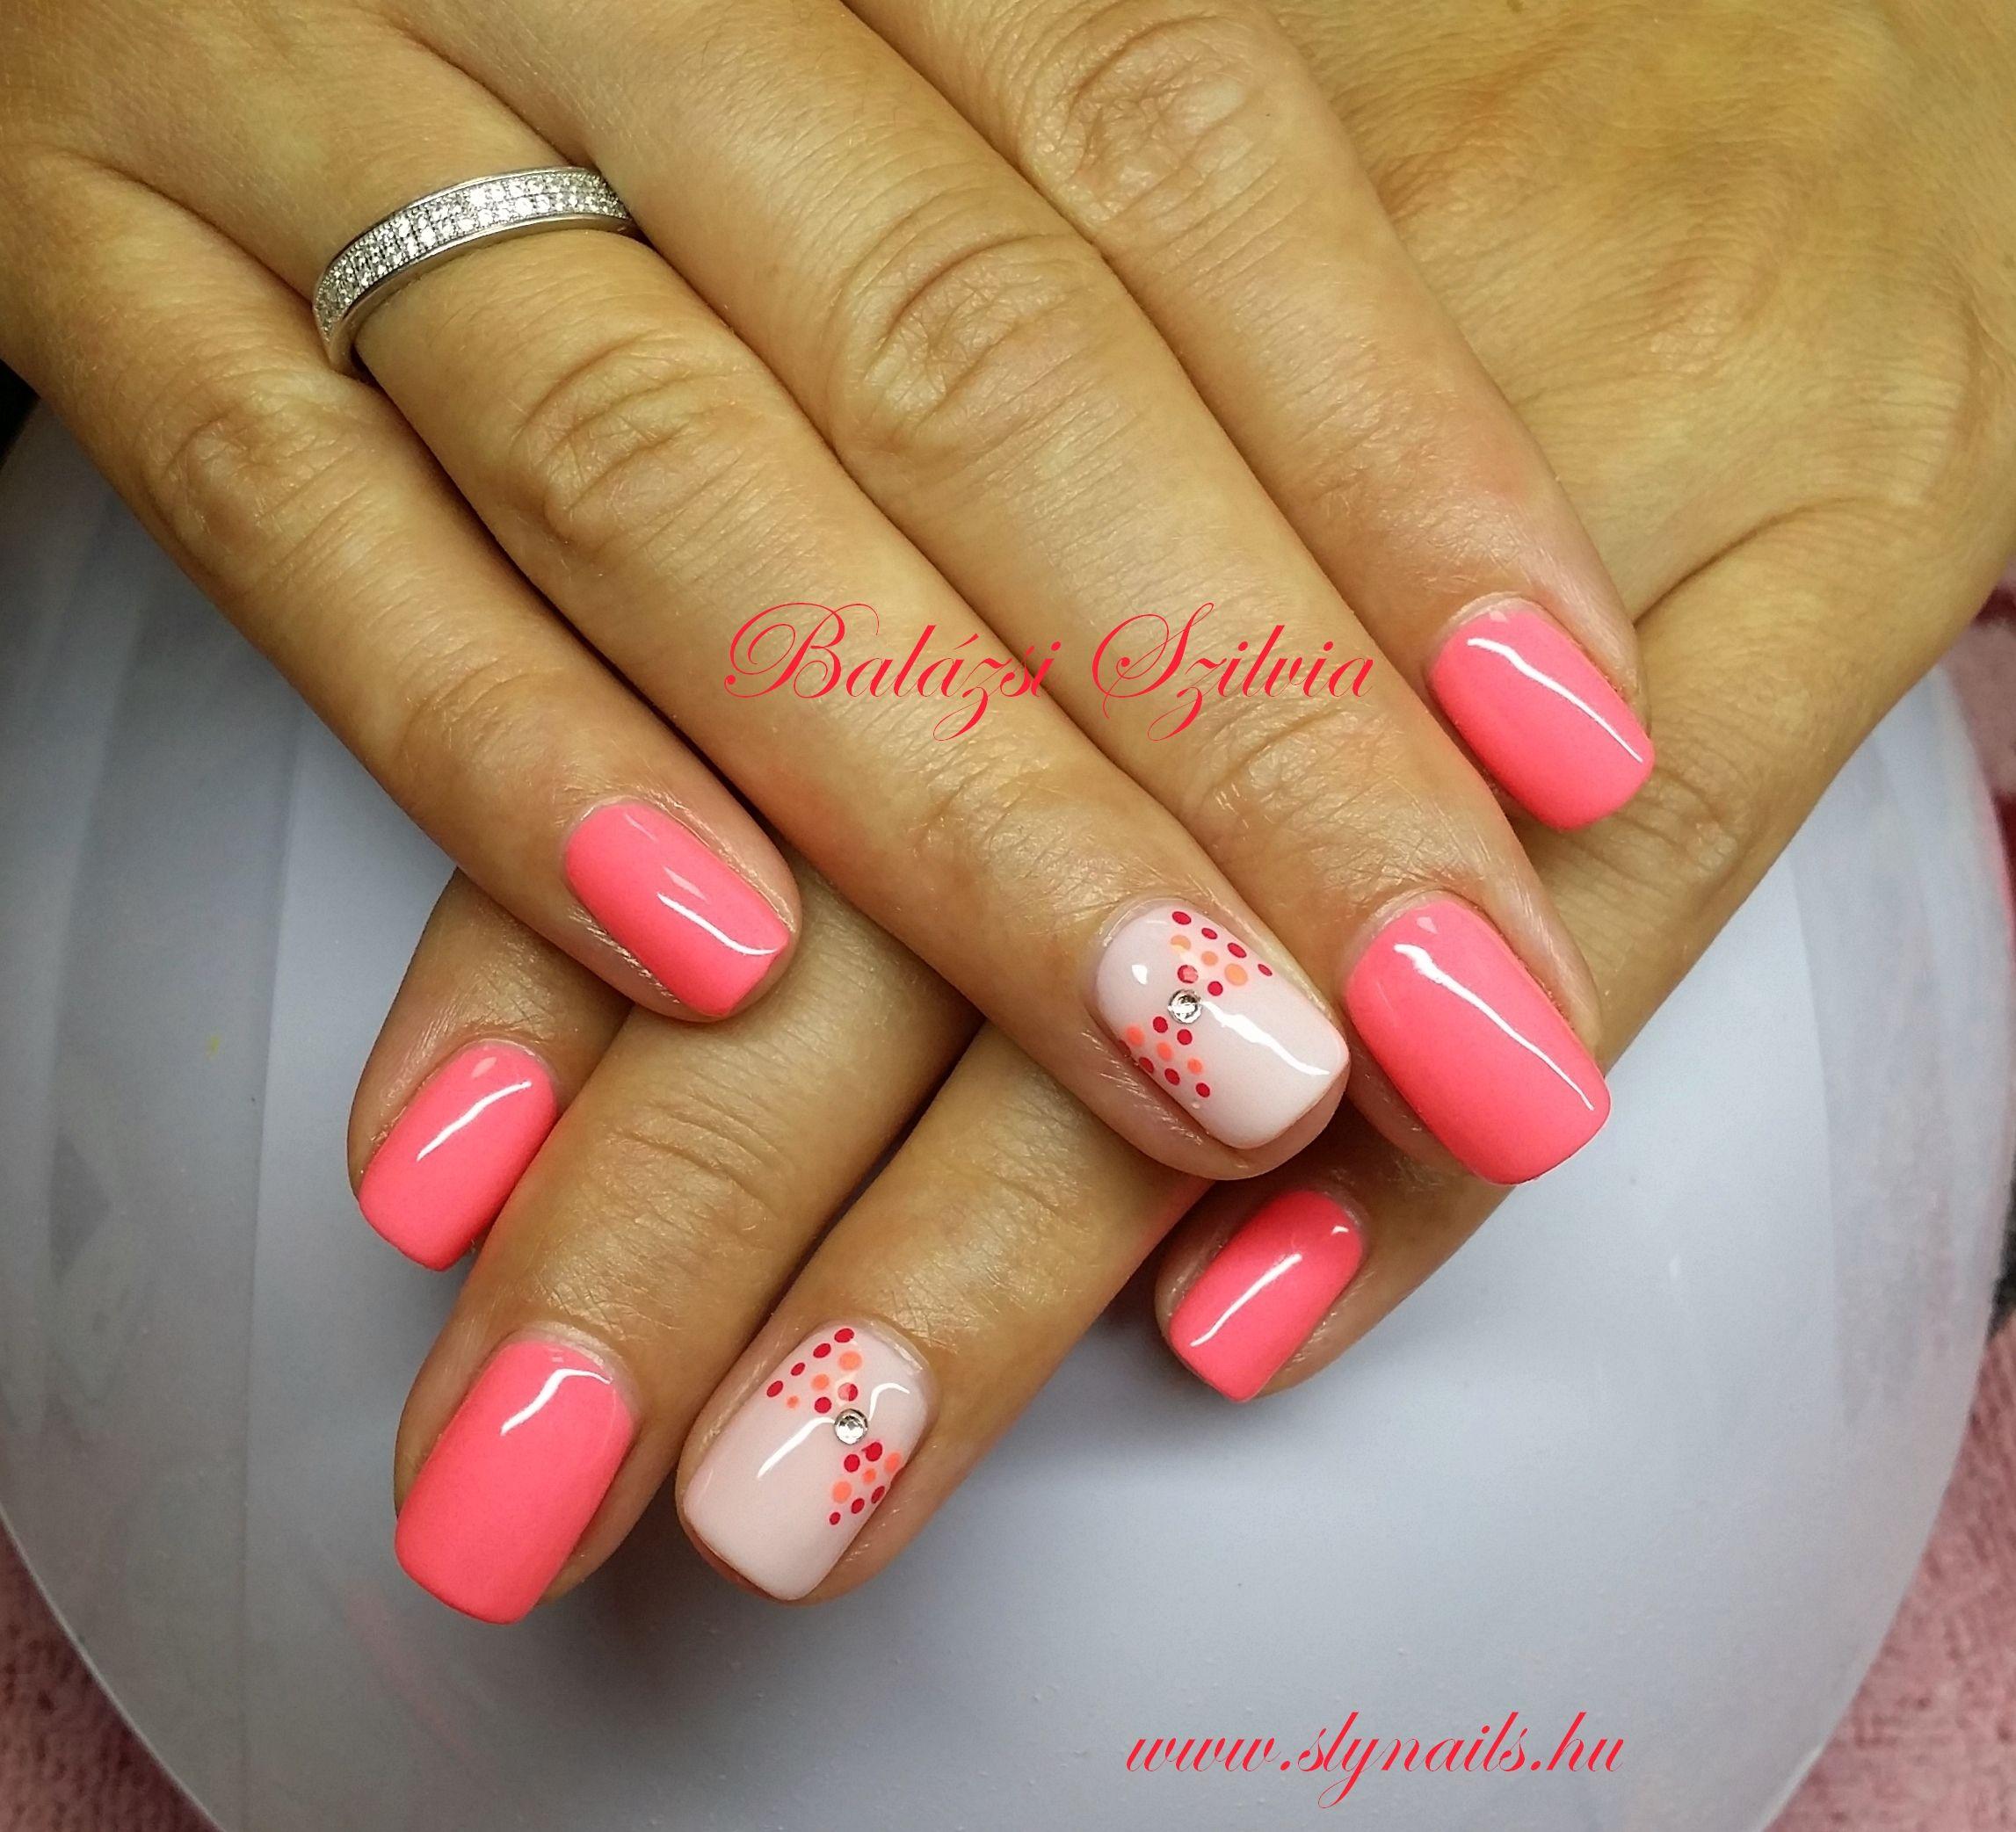 Neon Pink Gel Lakk Pink Nails Pretty Acrylic Nails Dream Nails